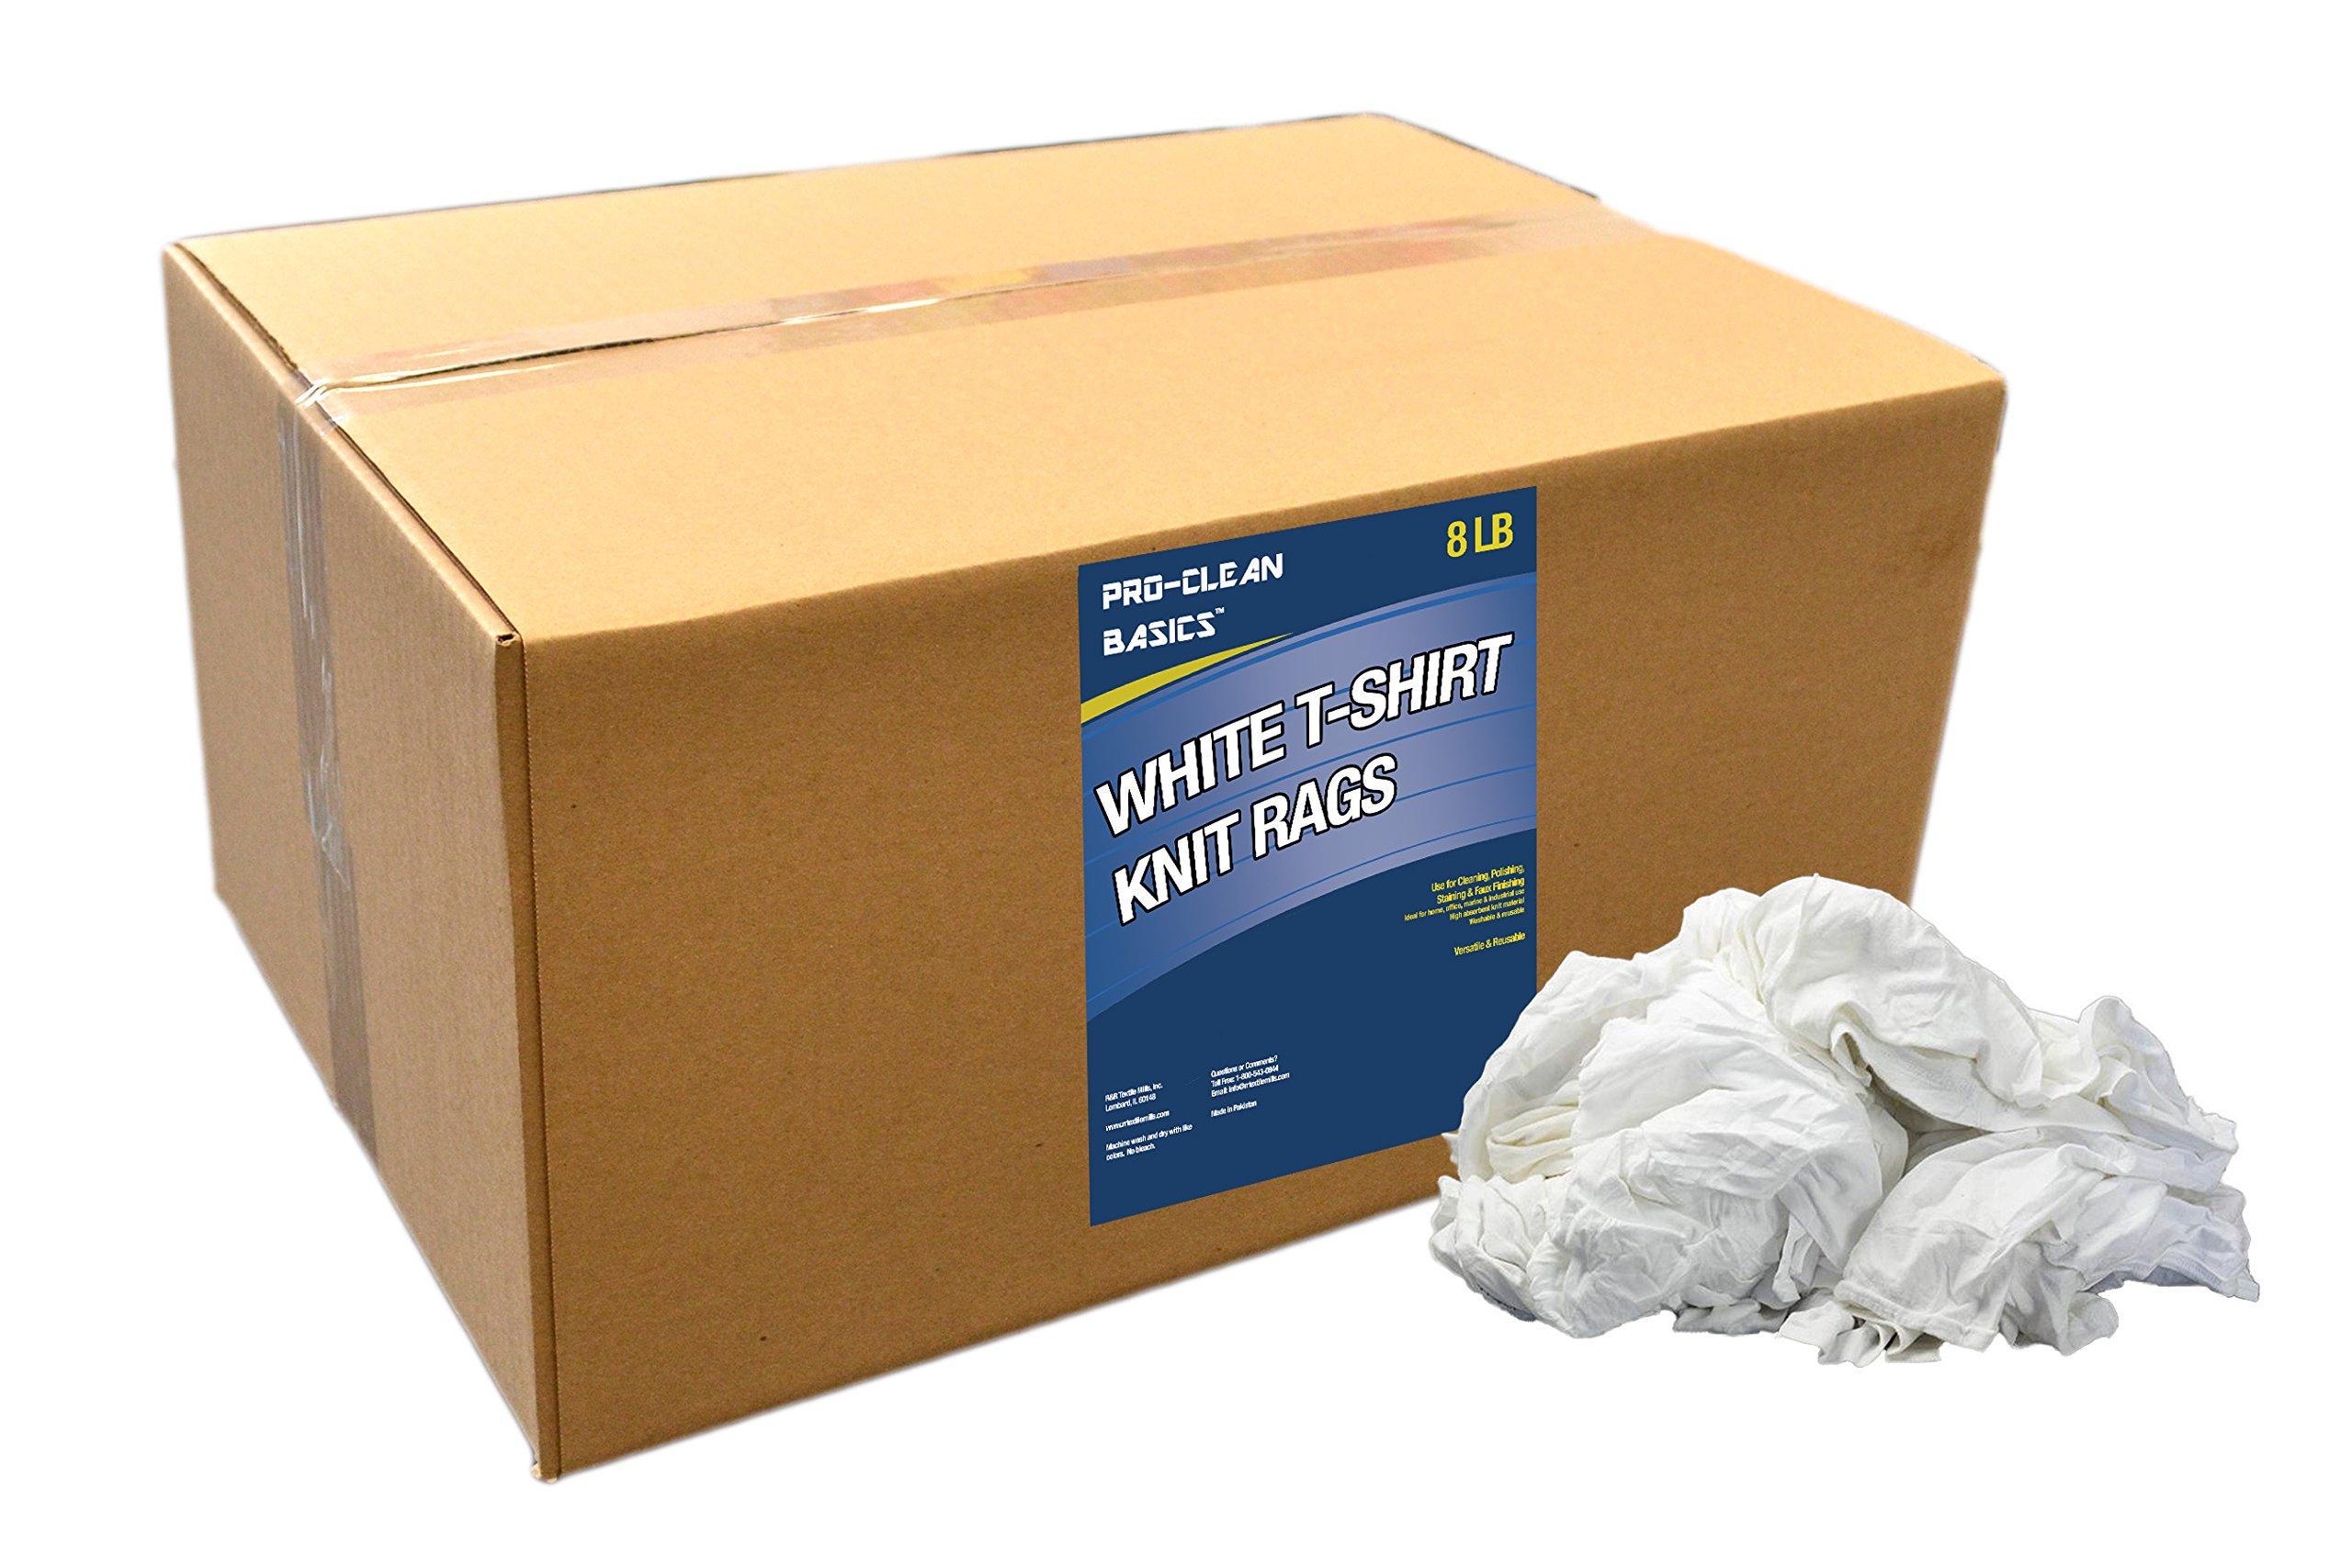 Pro-Clean Basics White T-Shirt Cloth Rags: 8 lb. Bag